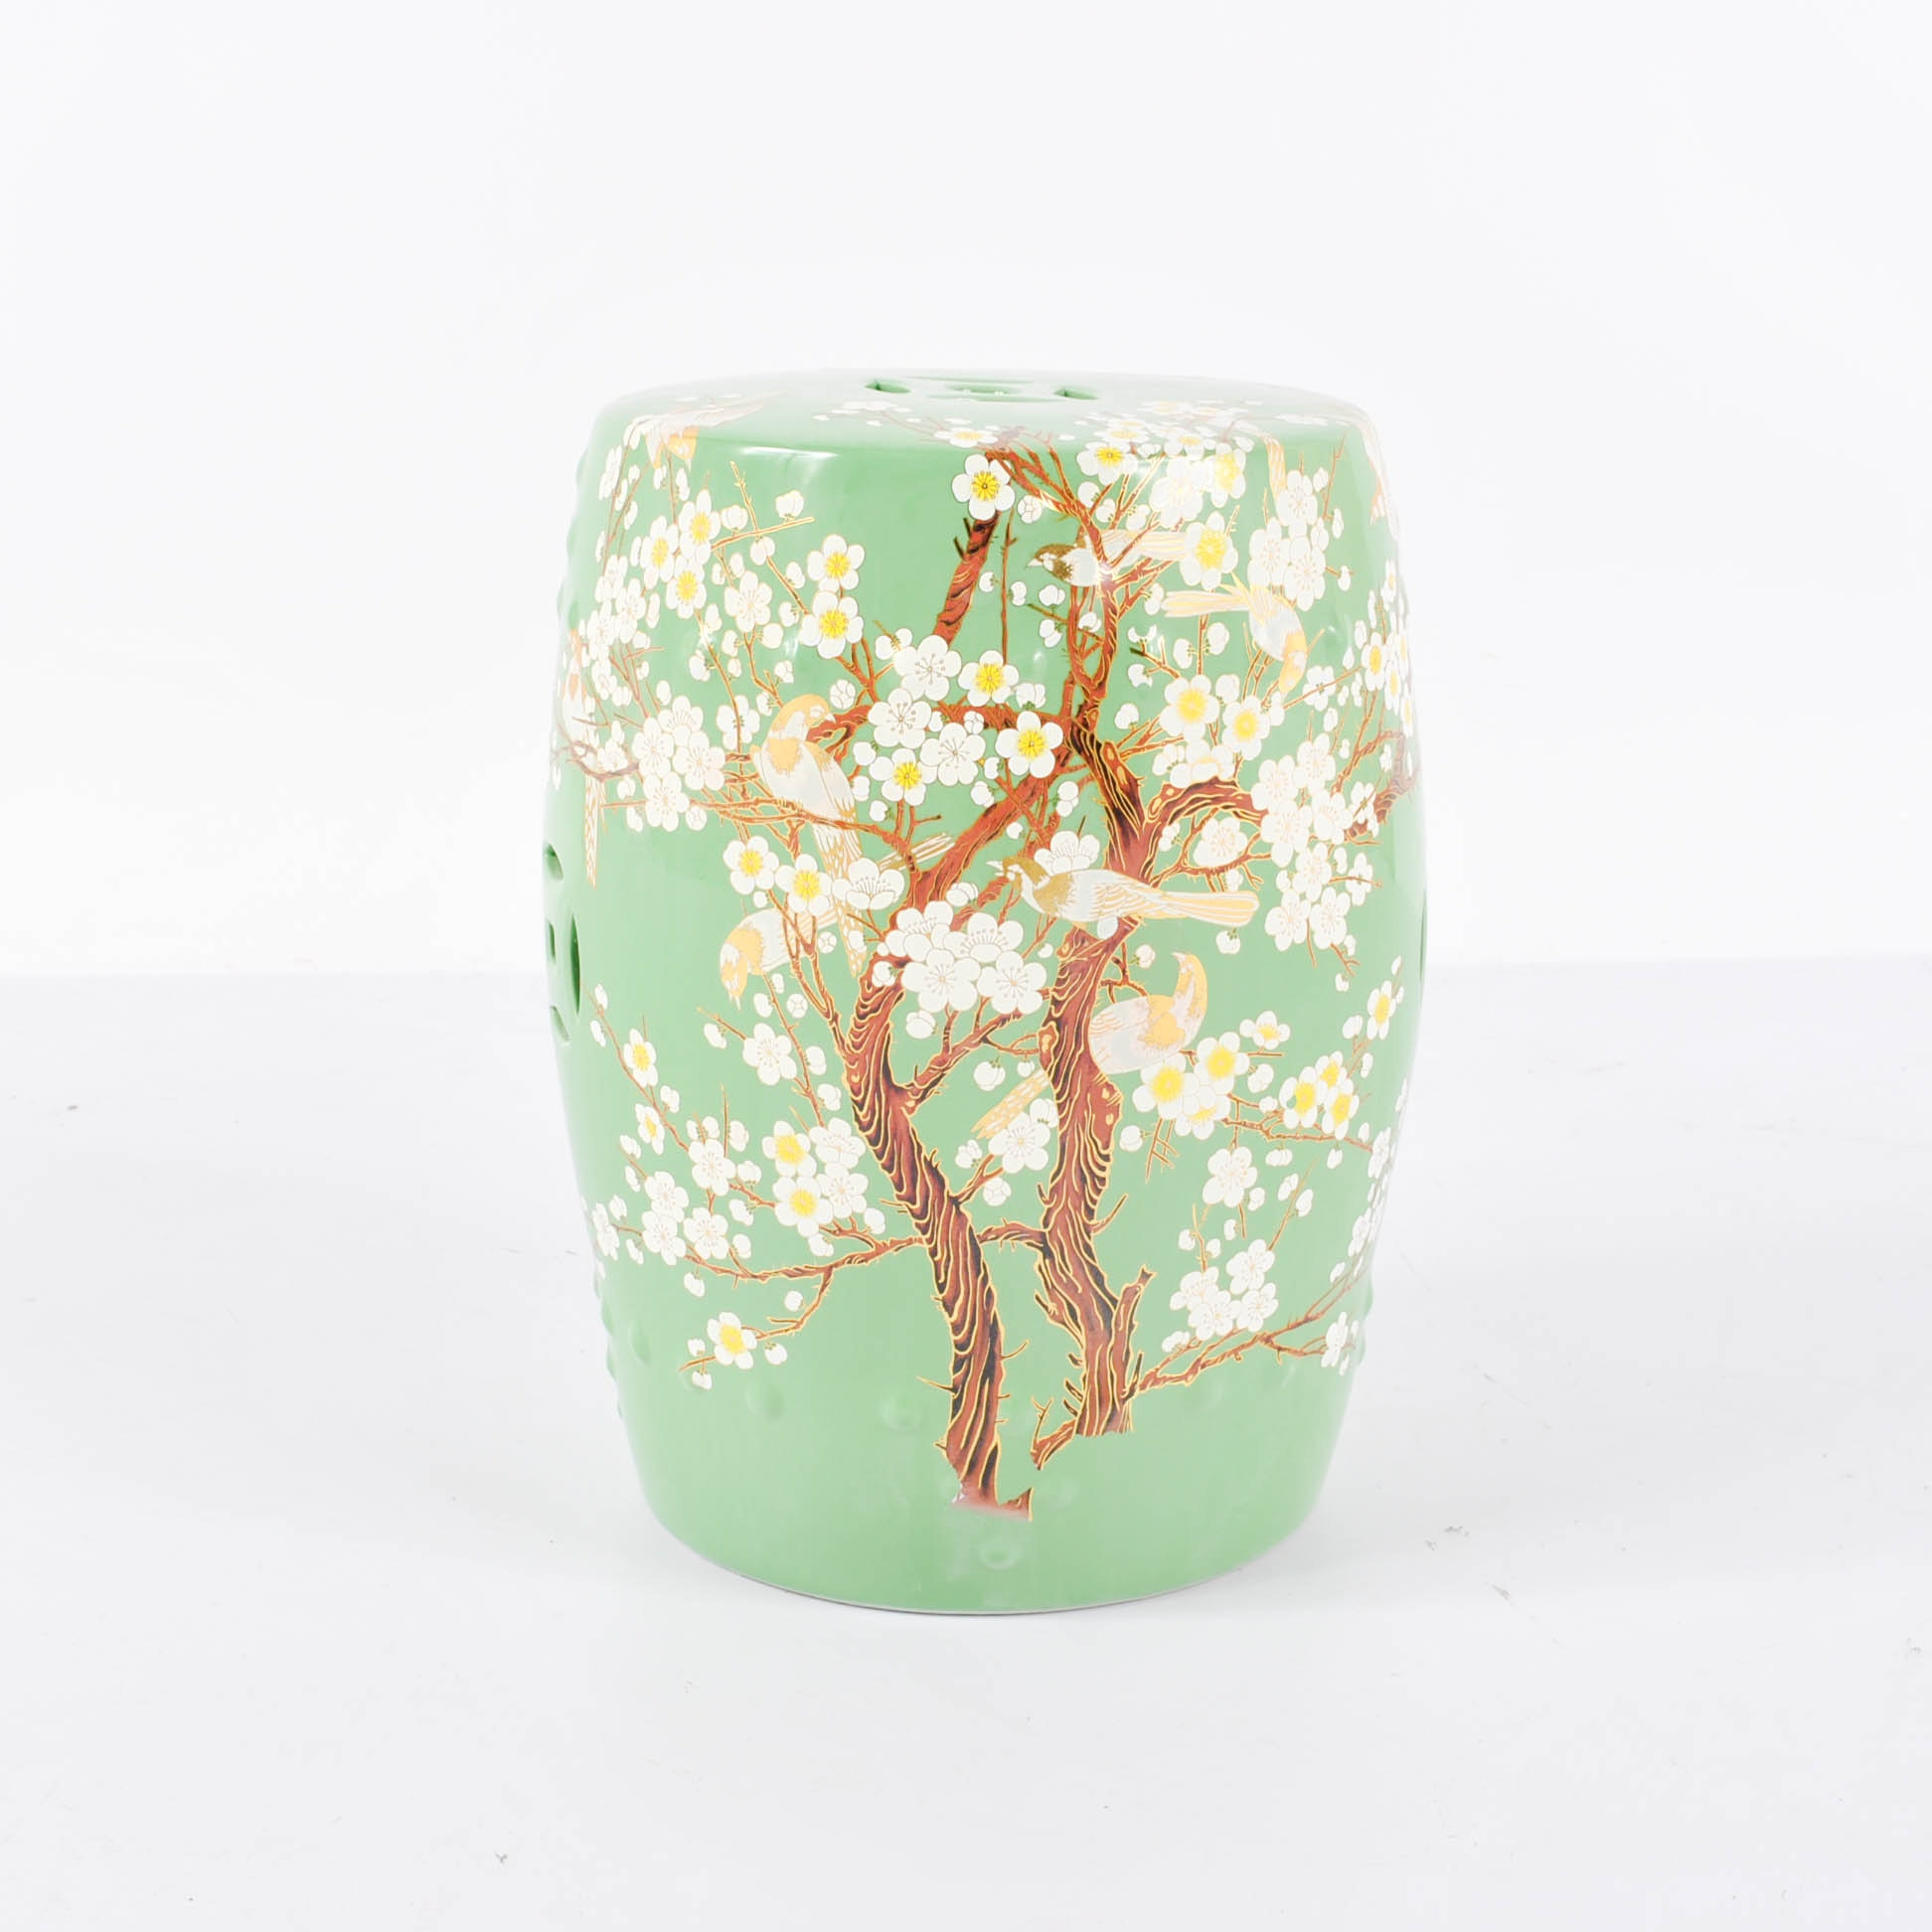 Chinese Plum Blossom Ceramic Garden Stool